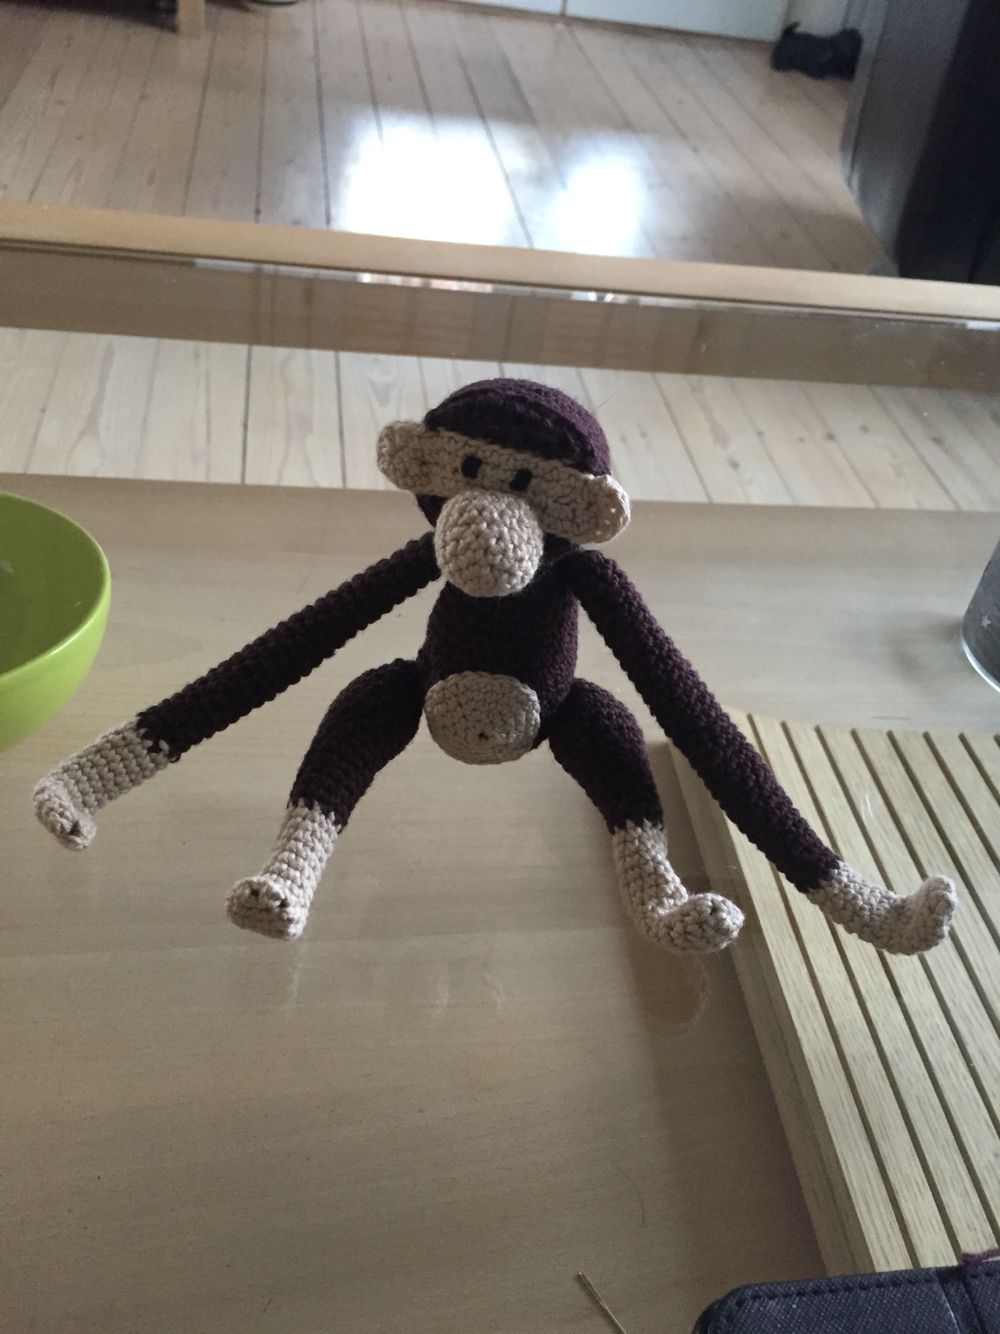 Monkey needlework. Tribute to Kay Bojesen